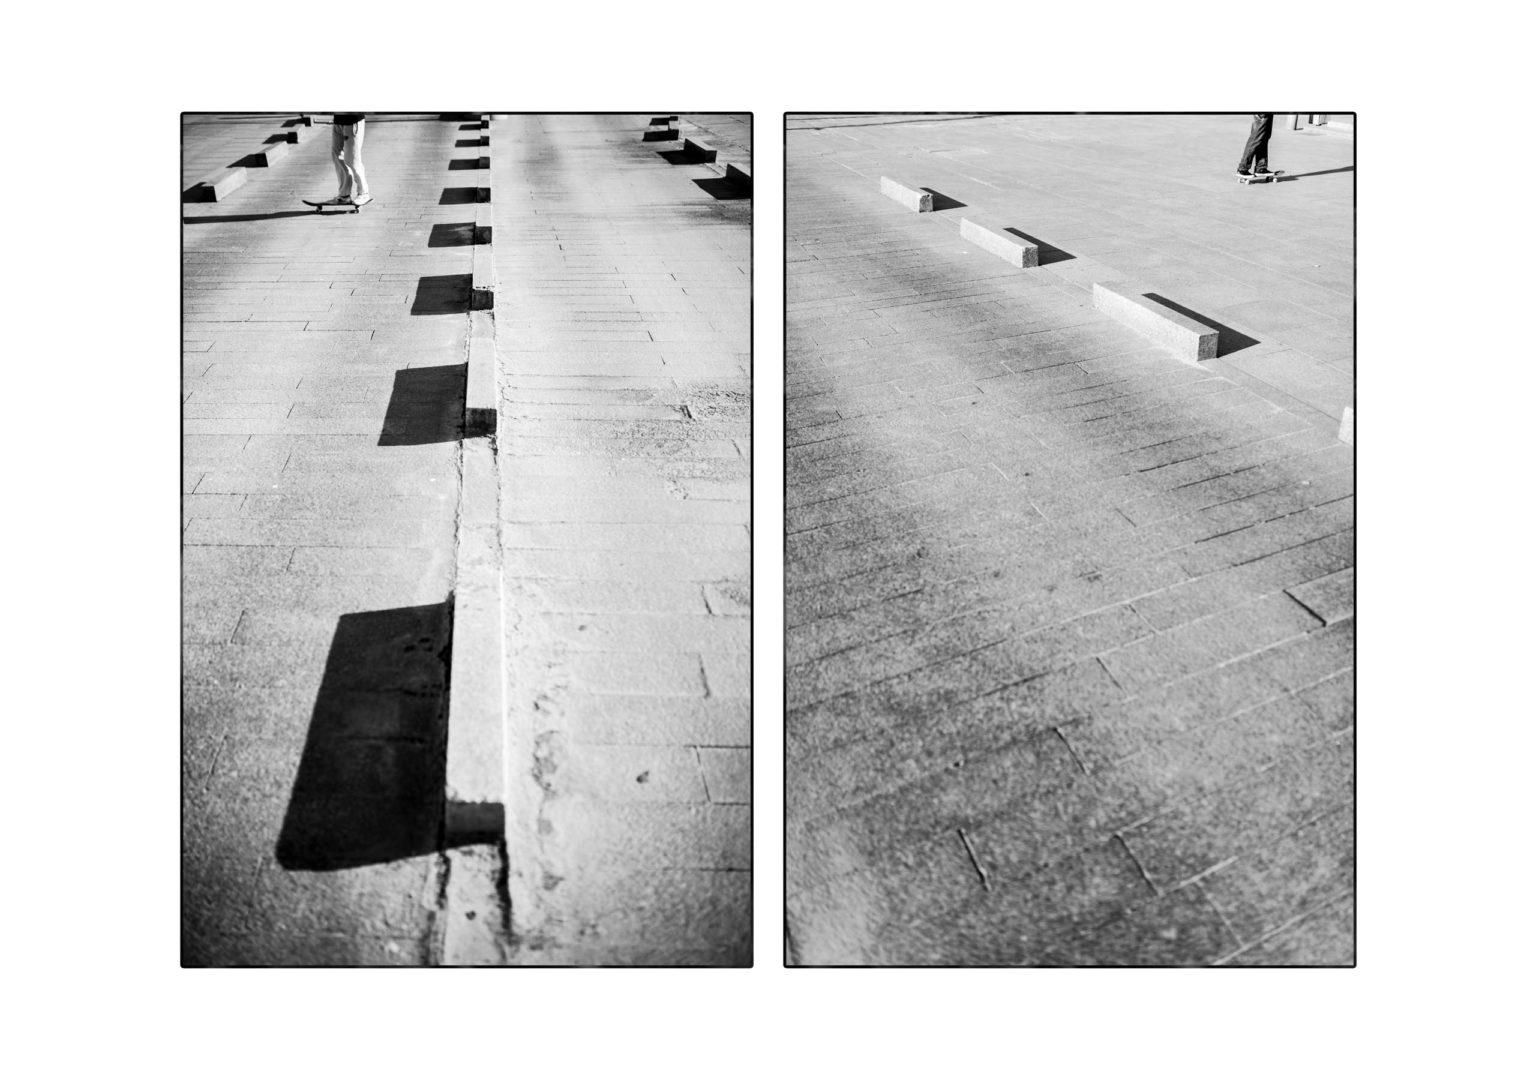 skateboarding_sk8lines_ aaron sio